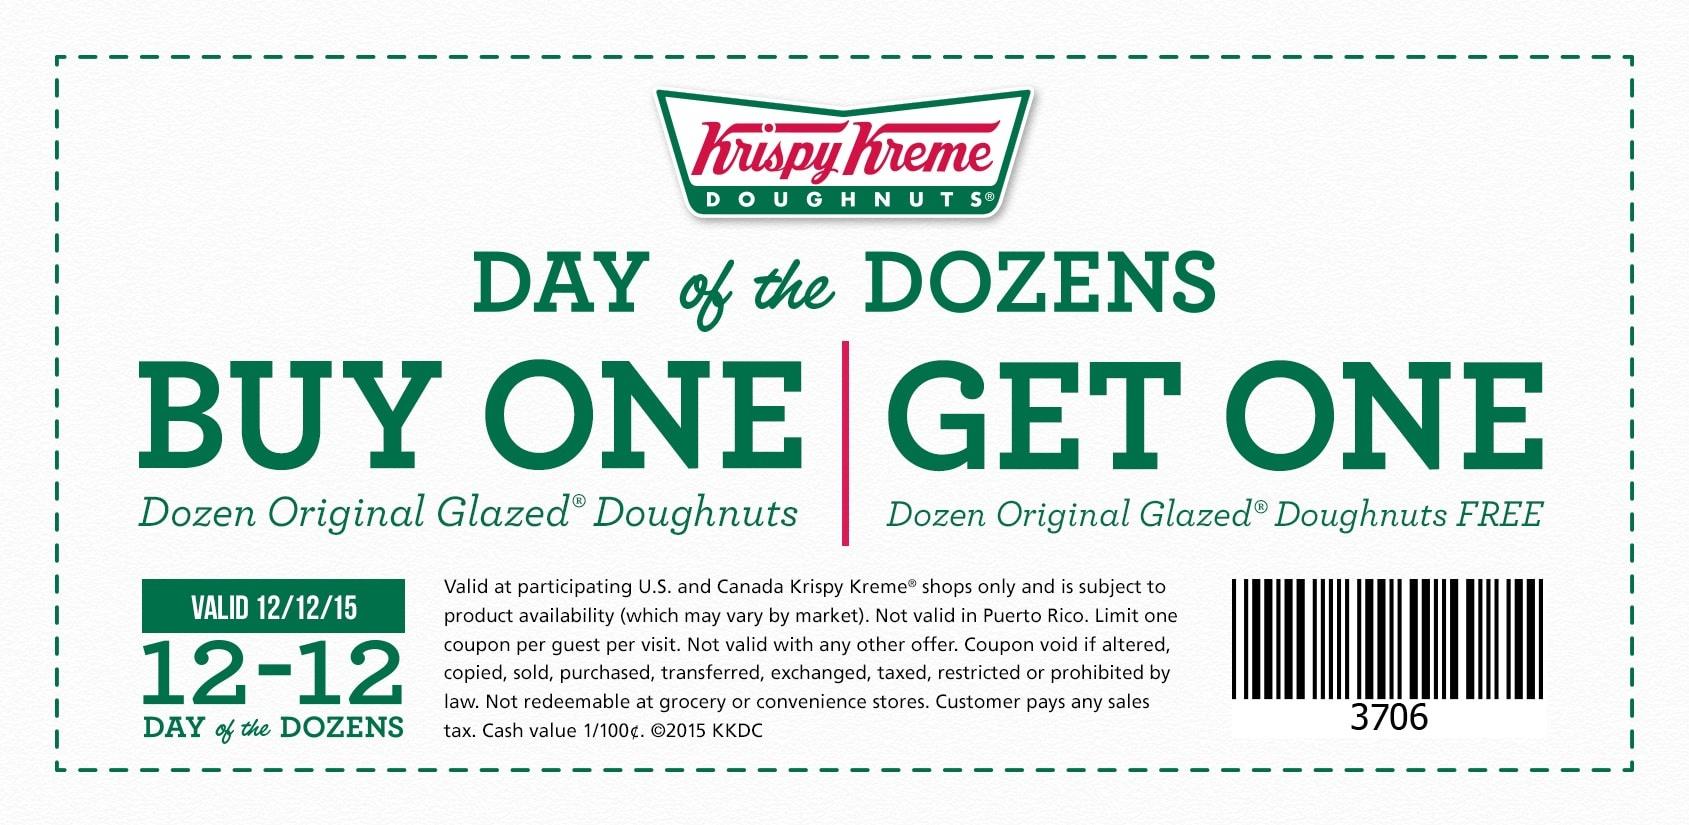 Bogo-Krispy-Kreme-Donuts-Coupons - Bogo Free Coupons Printable